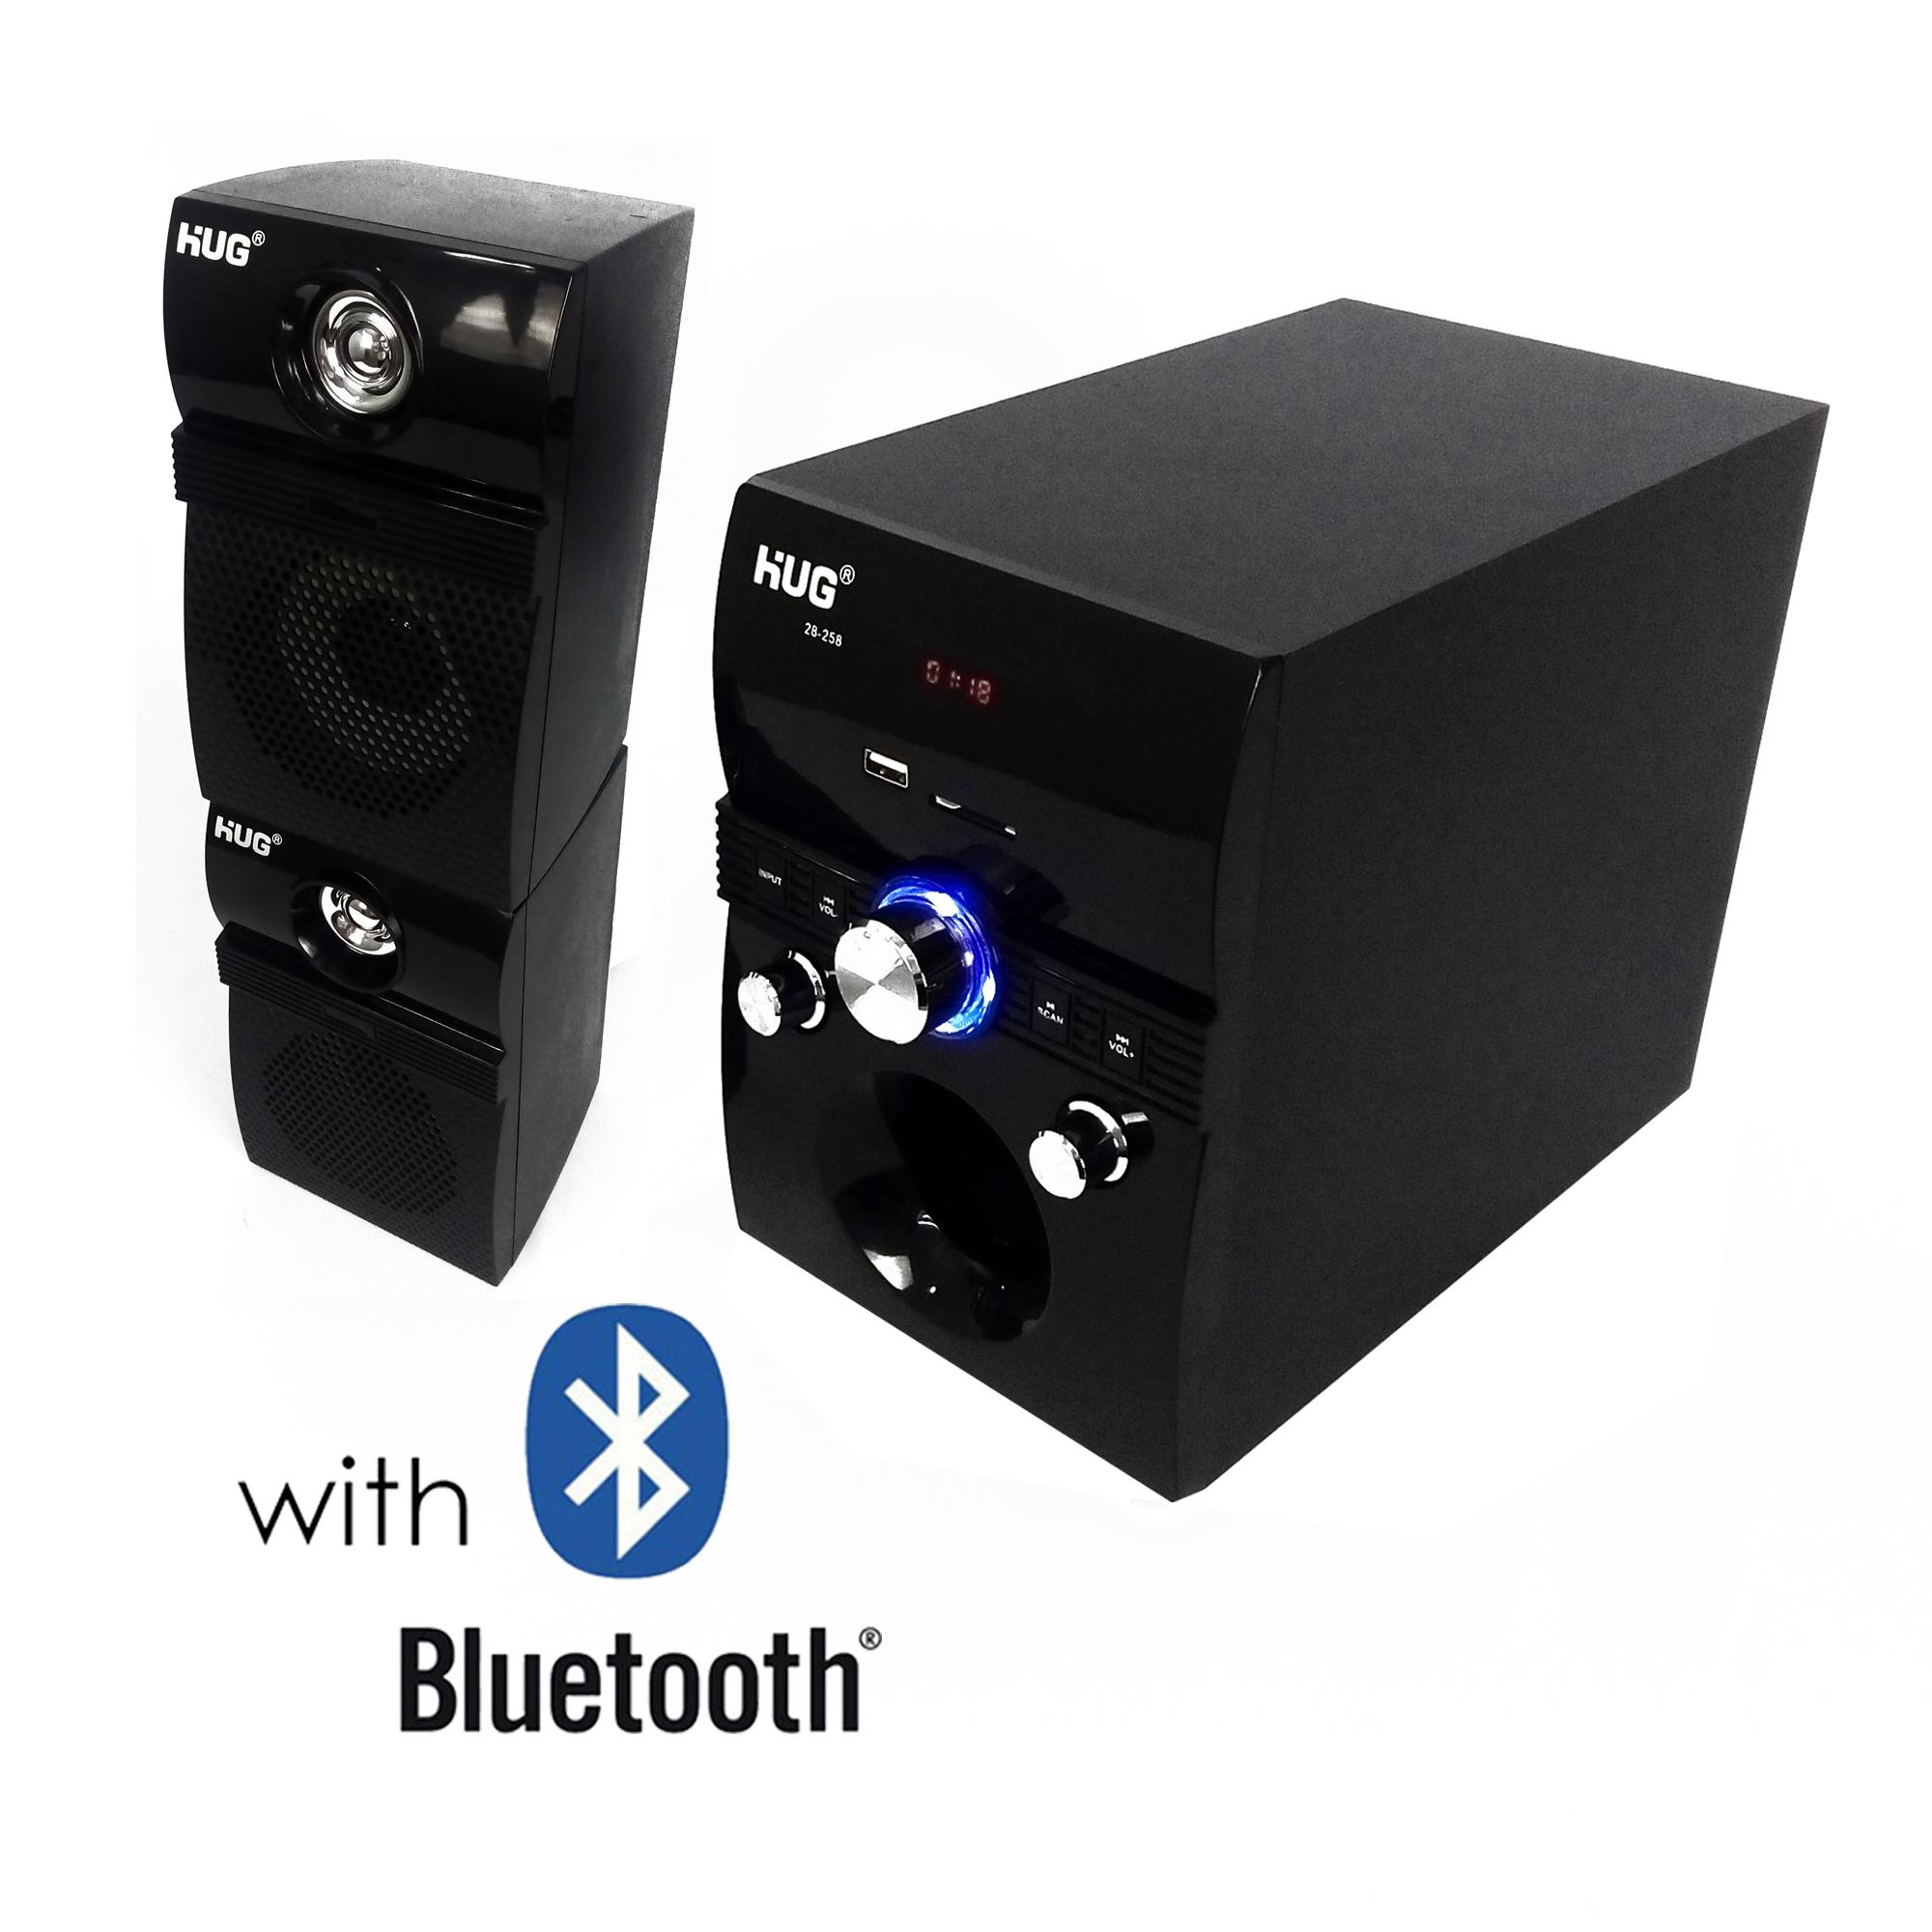 Subwoofer For Sale Speaker Prices Brands Specs In 8 Inch Jl Audio Hug H28 258 W Usb Slot Built Fm Radio